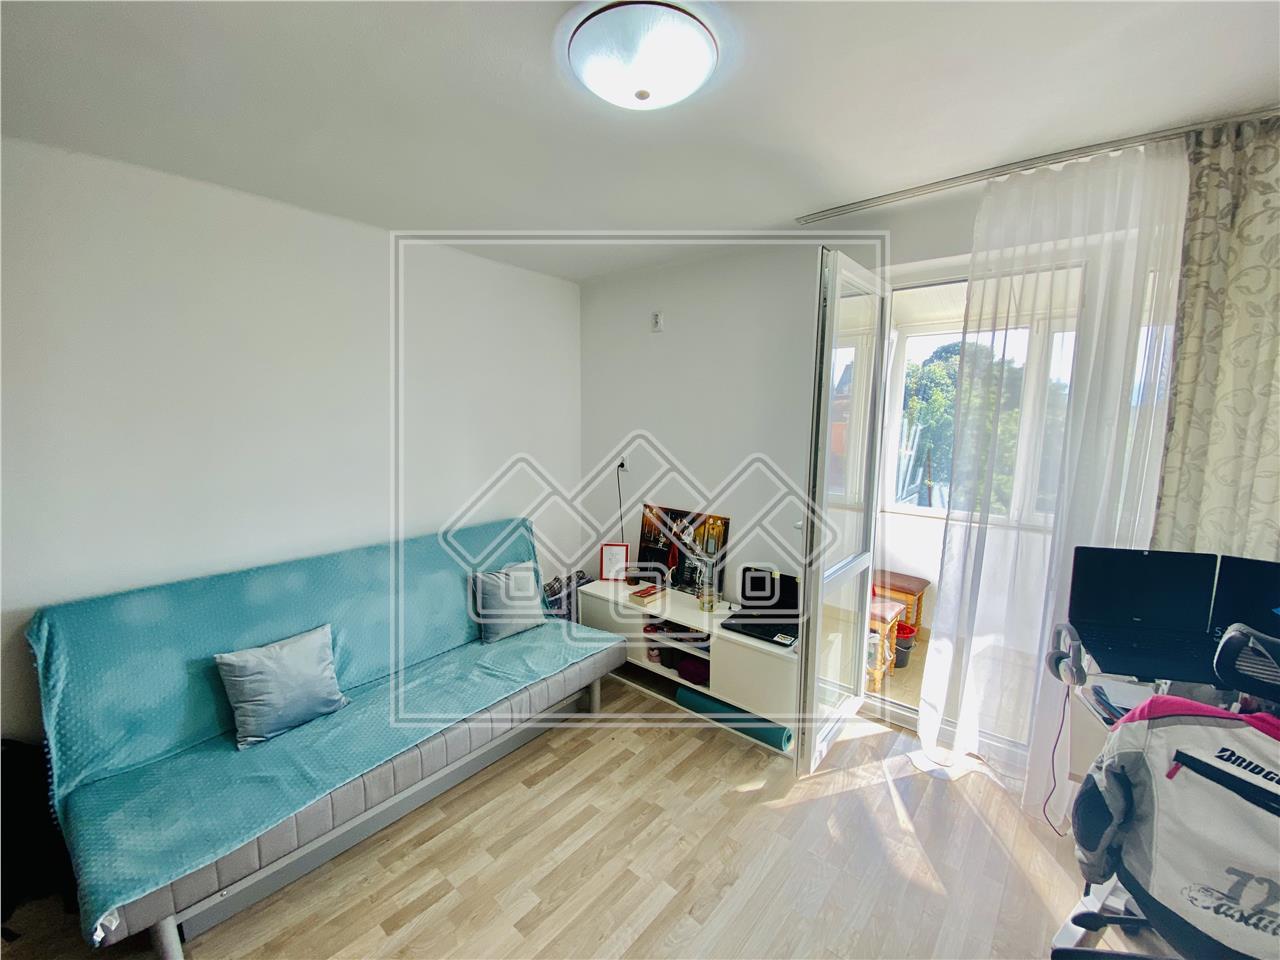 Apartament de vanzare in Sibiu - 2 camere cu balcon - B-dul Victoriei